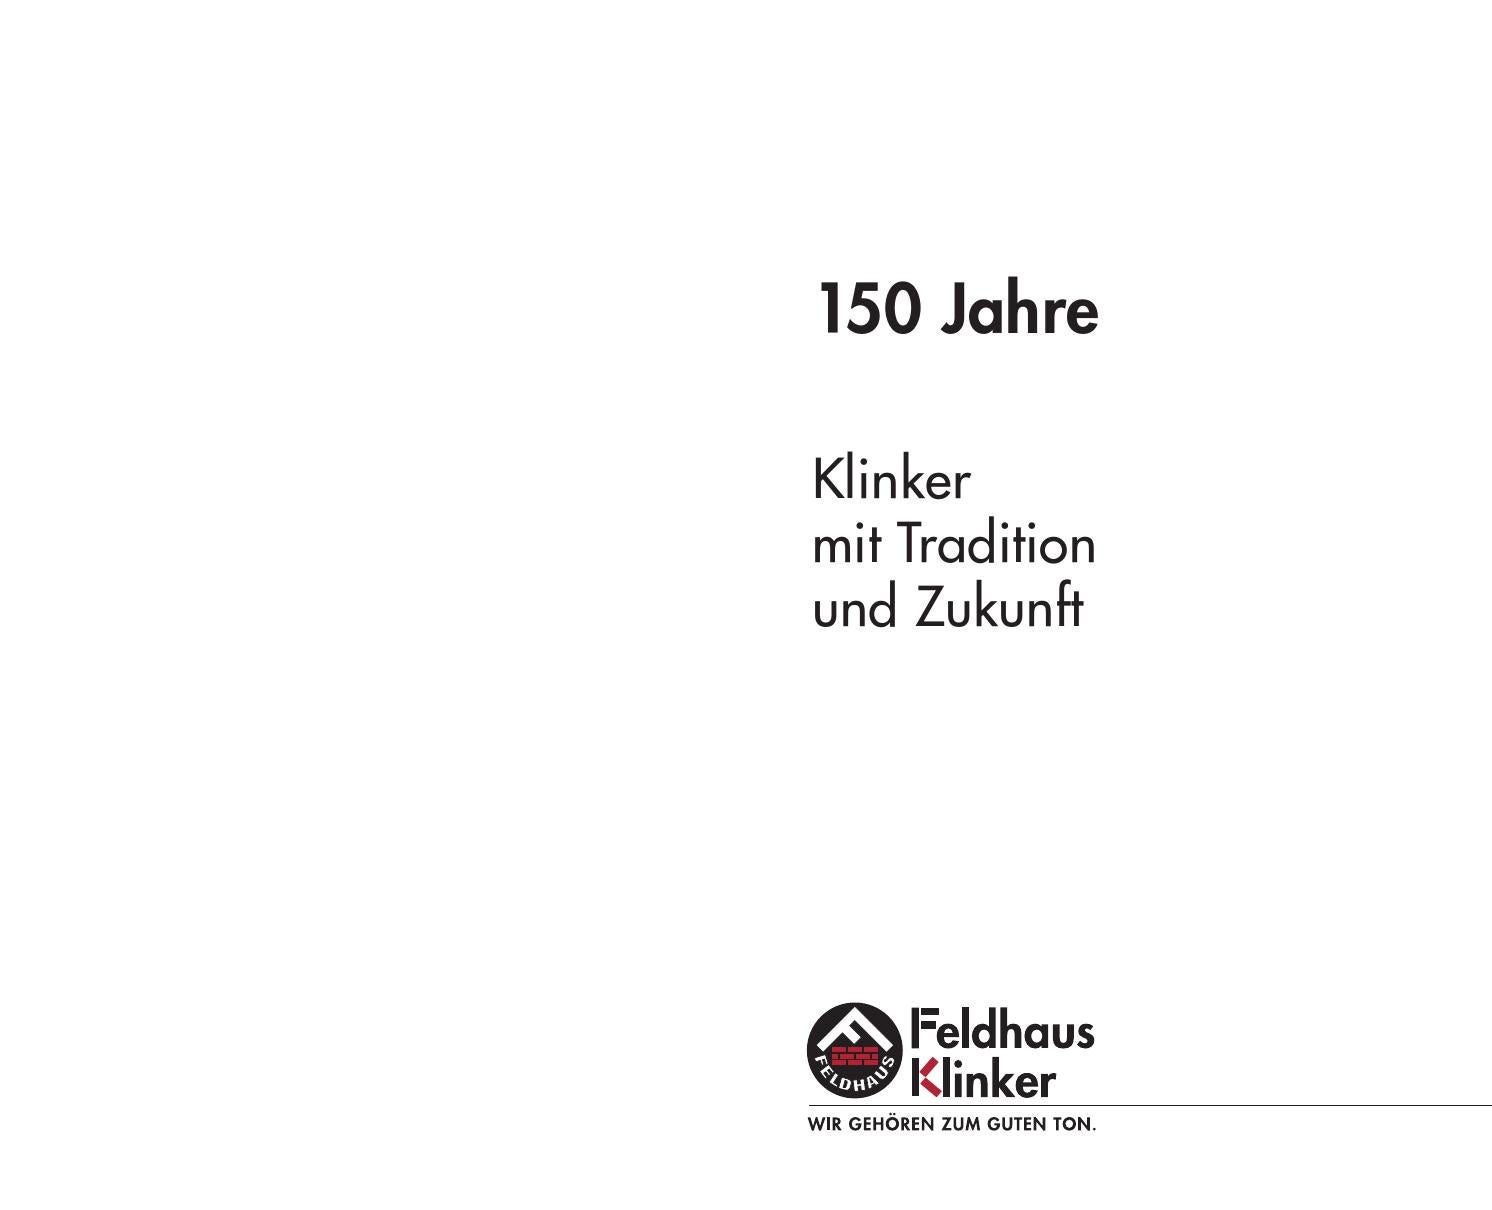 feldhaus klinker 150 jahre by feldhaus klinker vertriebs gmbh issuu. Black Bedroom Furniture Sets. Home Design Ideas